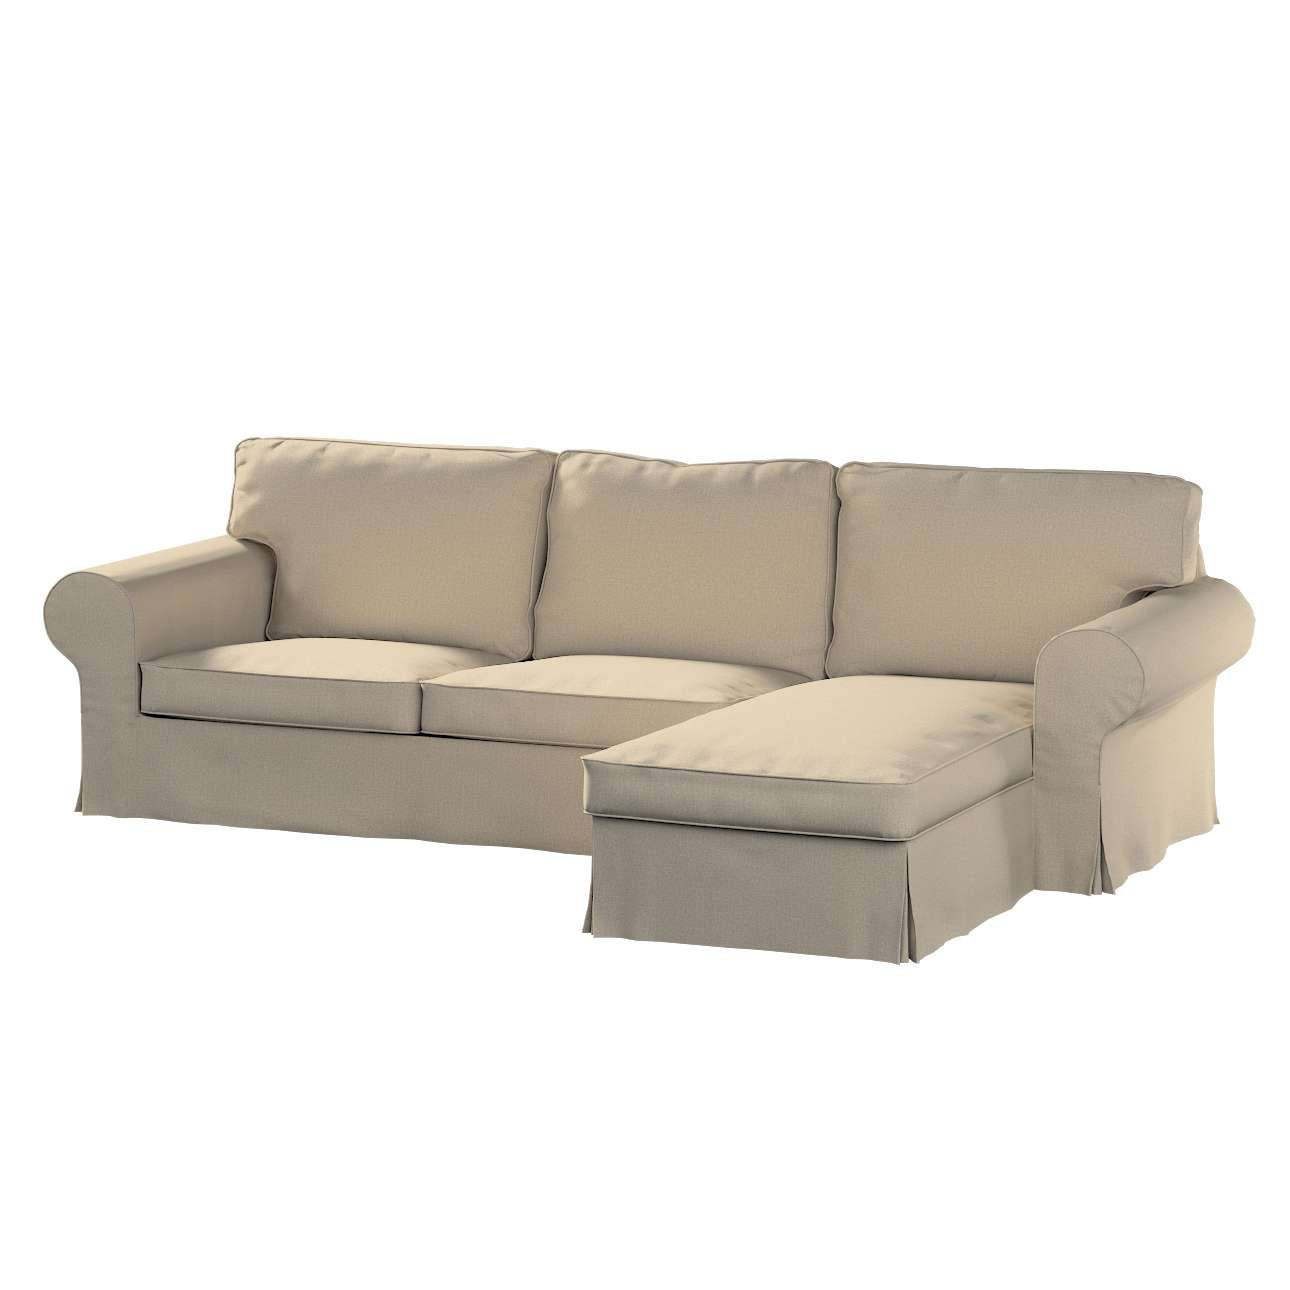 Potah na pohovku IKEA Ektorp 2-místná se šezlongem sofa ektorp 2-0s. i leżanka v kolekci Edinburgh, látka: 115-78